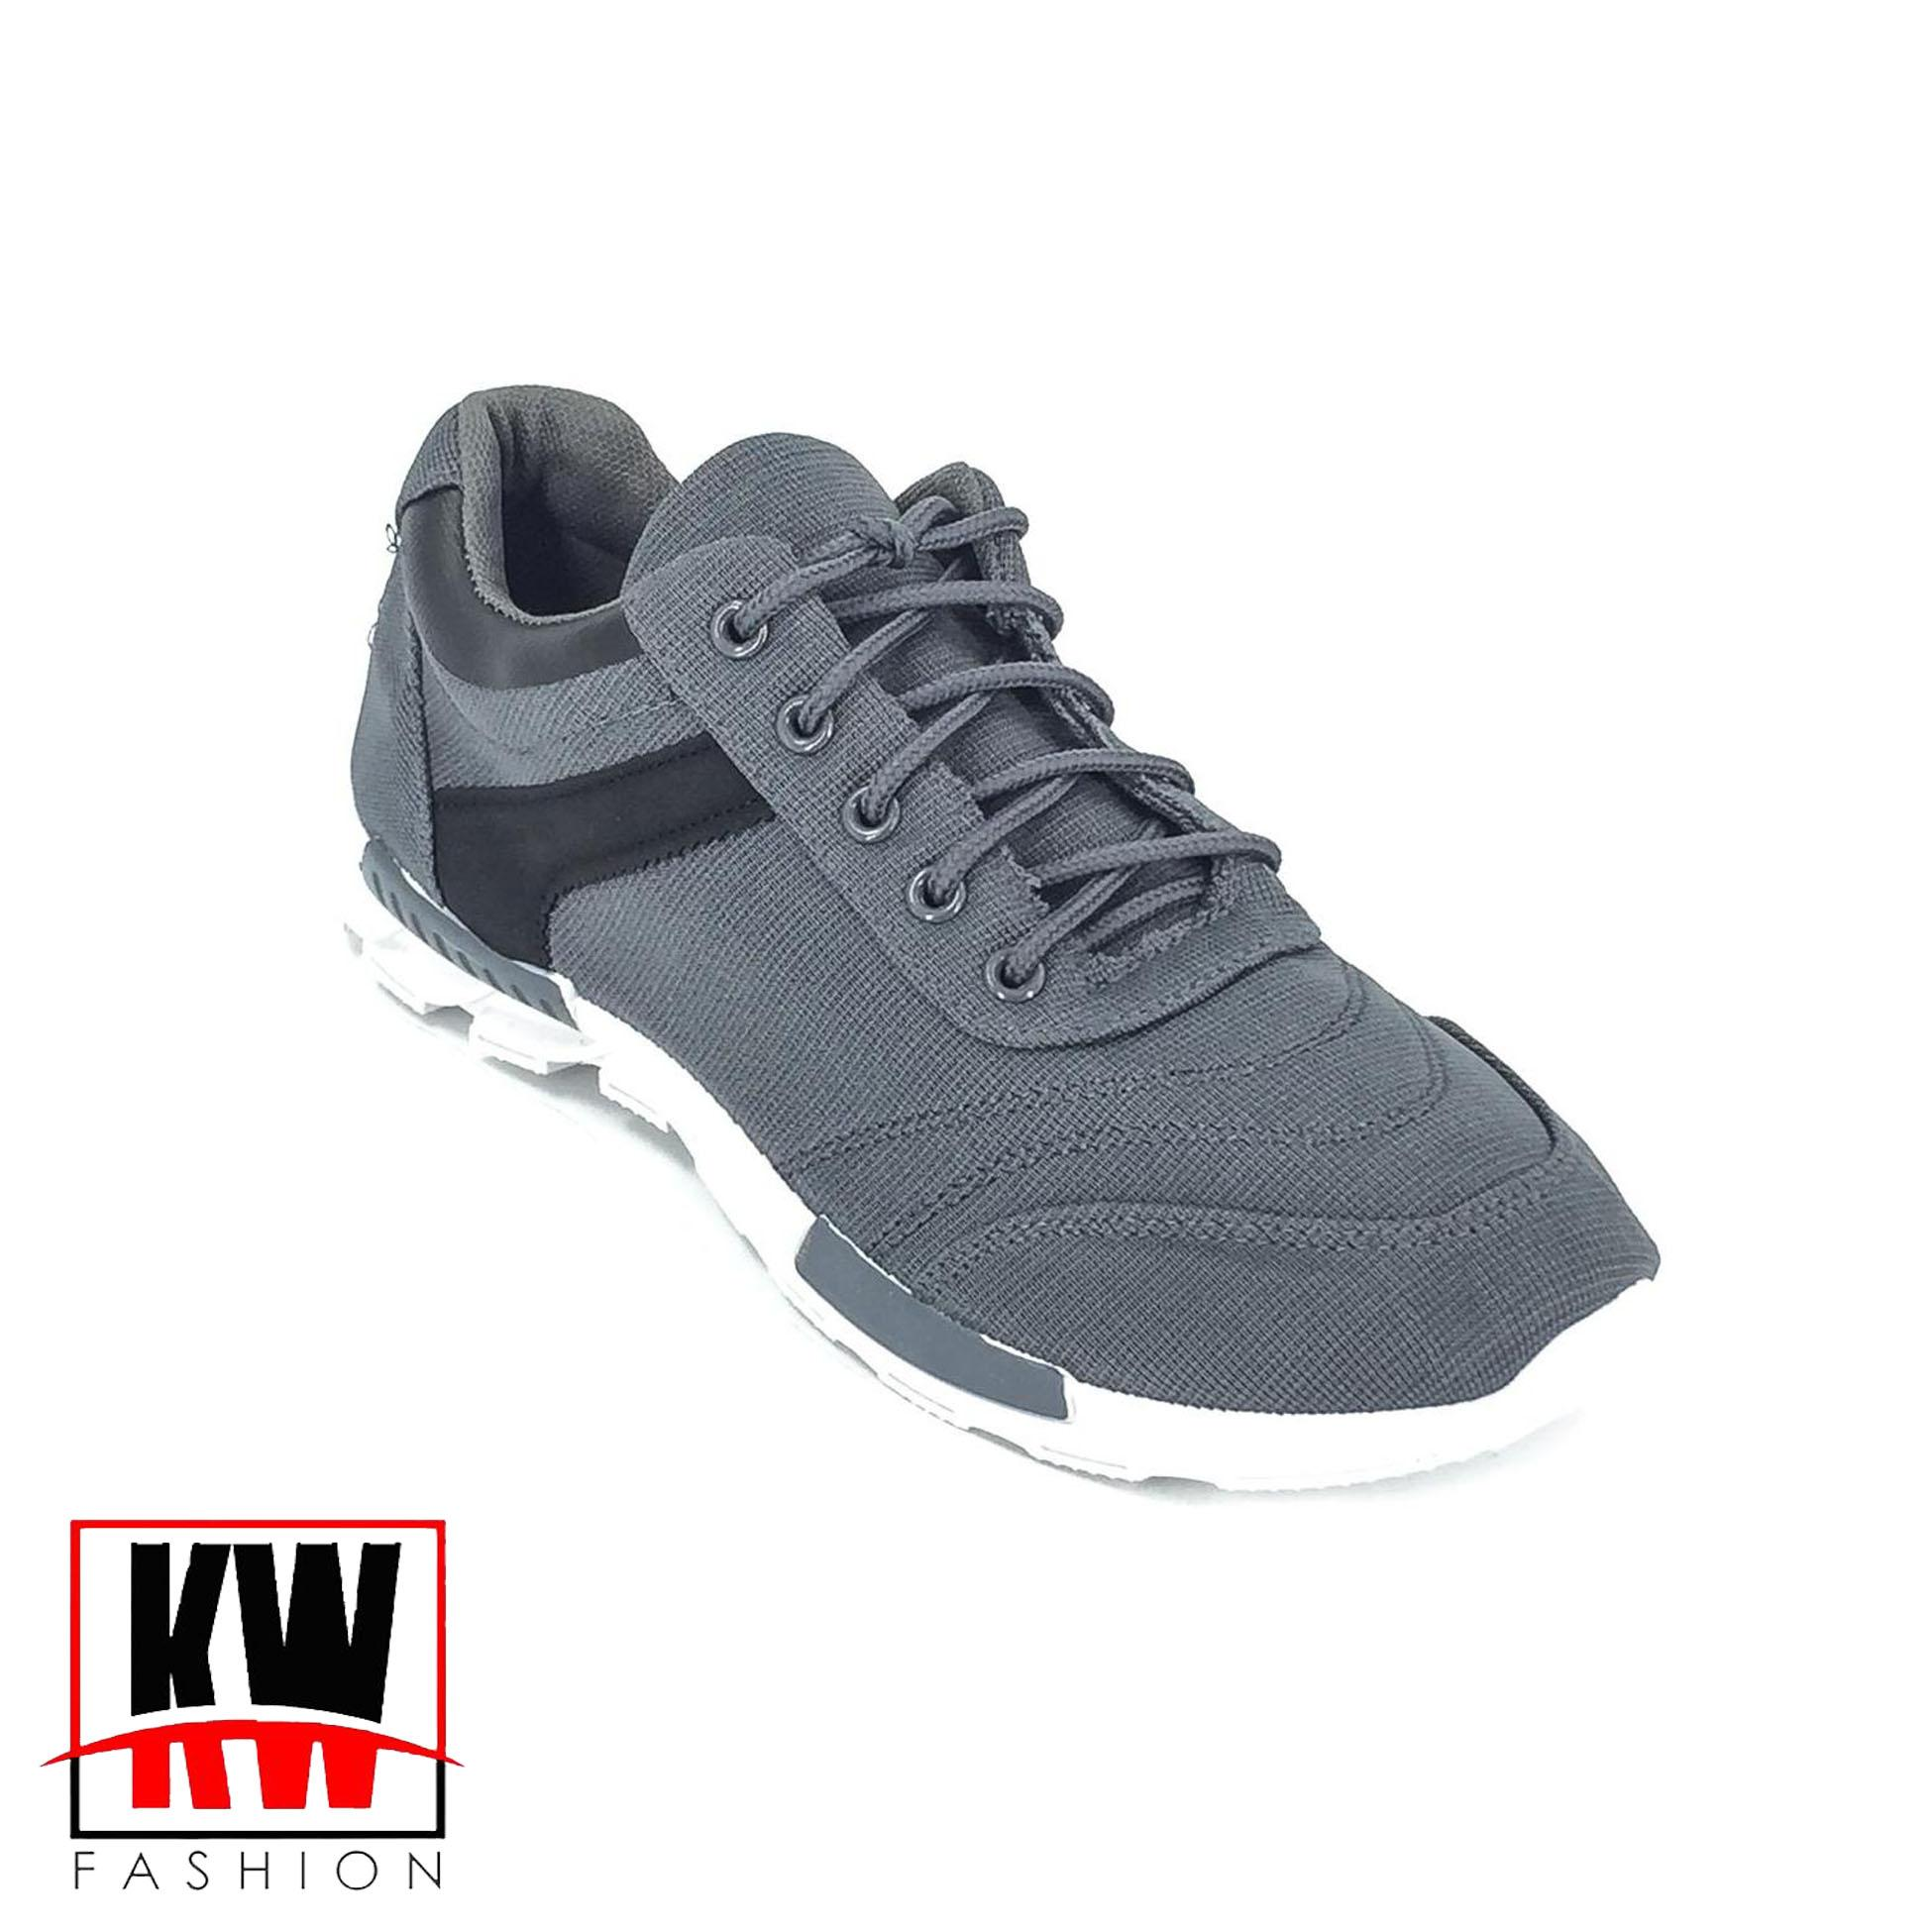 3ba7f79c9f35a5 Shoes for Men for sale - Mens Fashion Shoes online brands